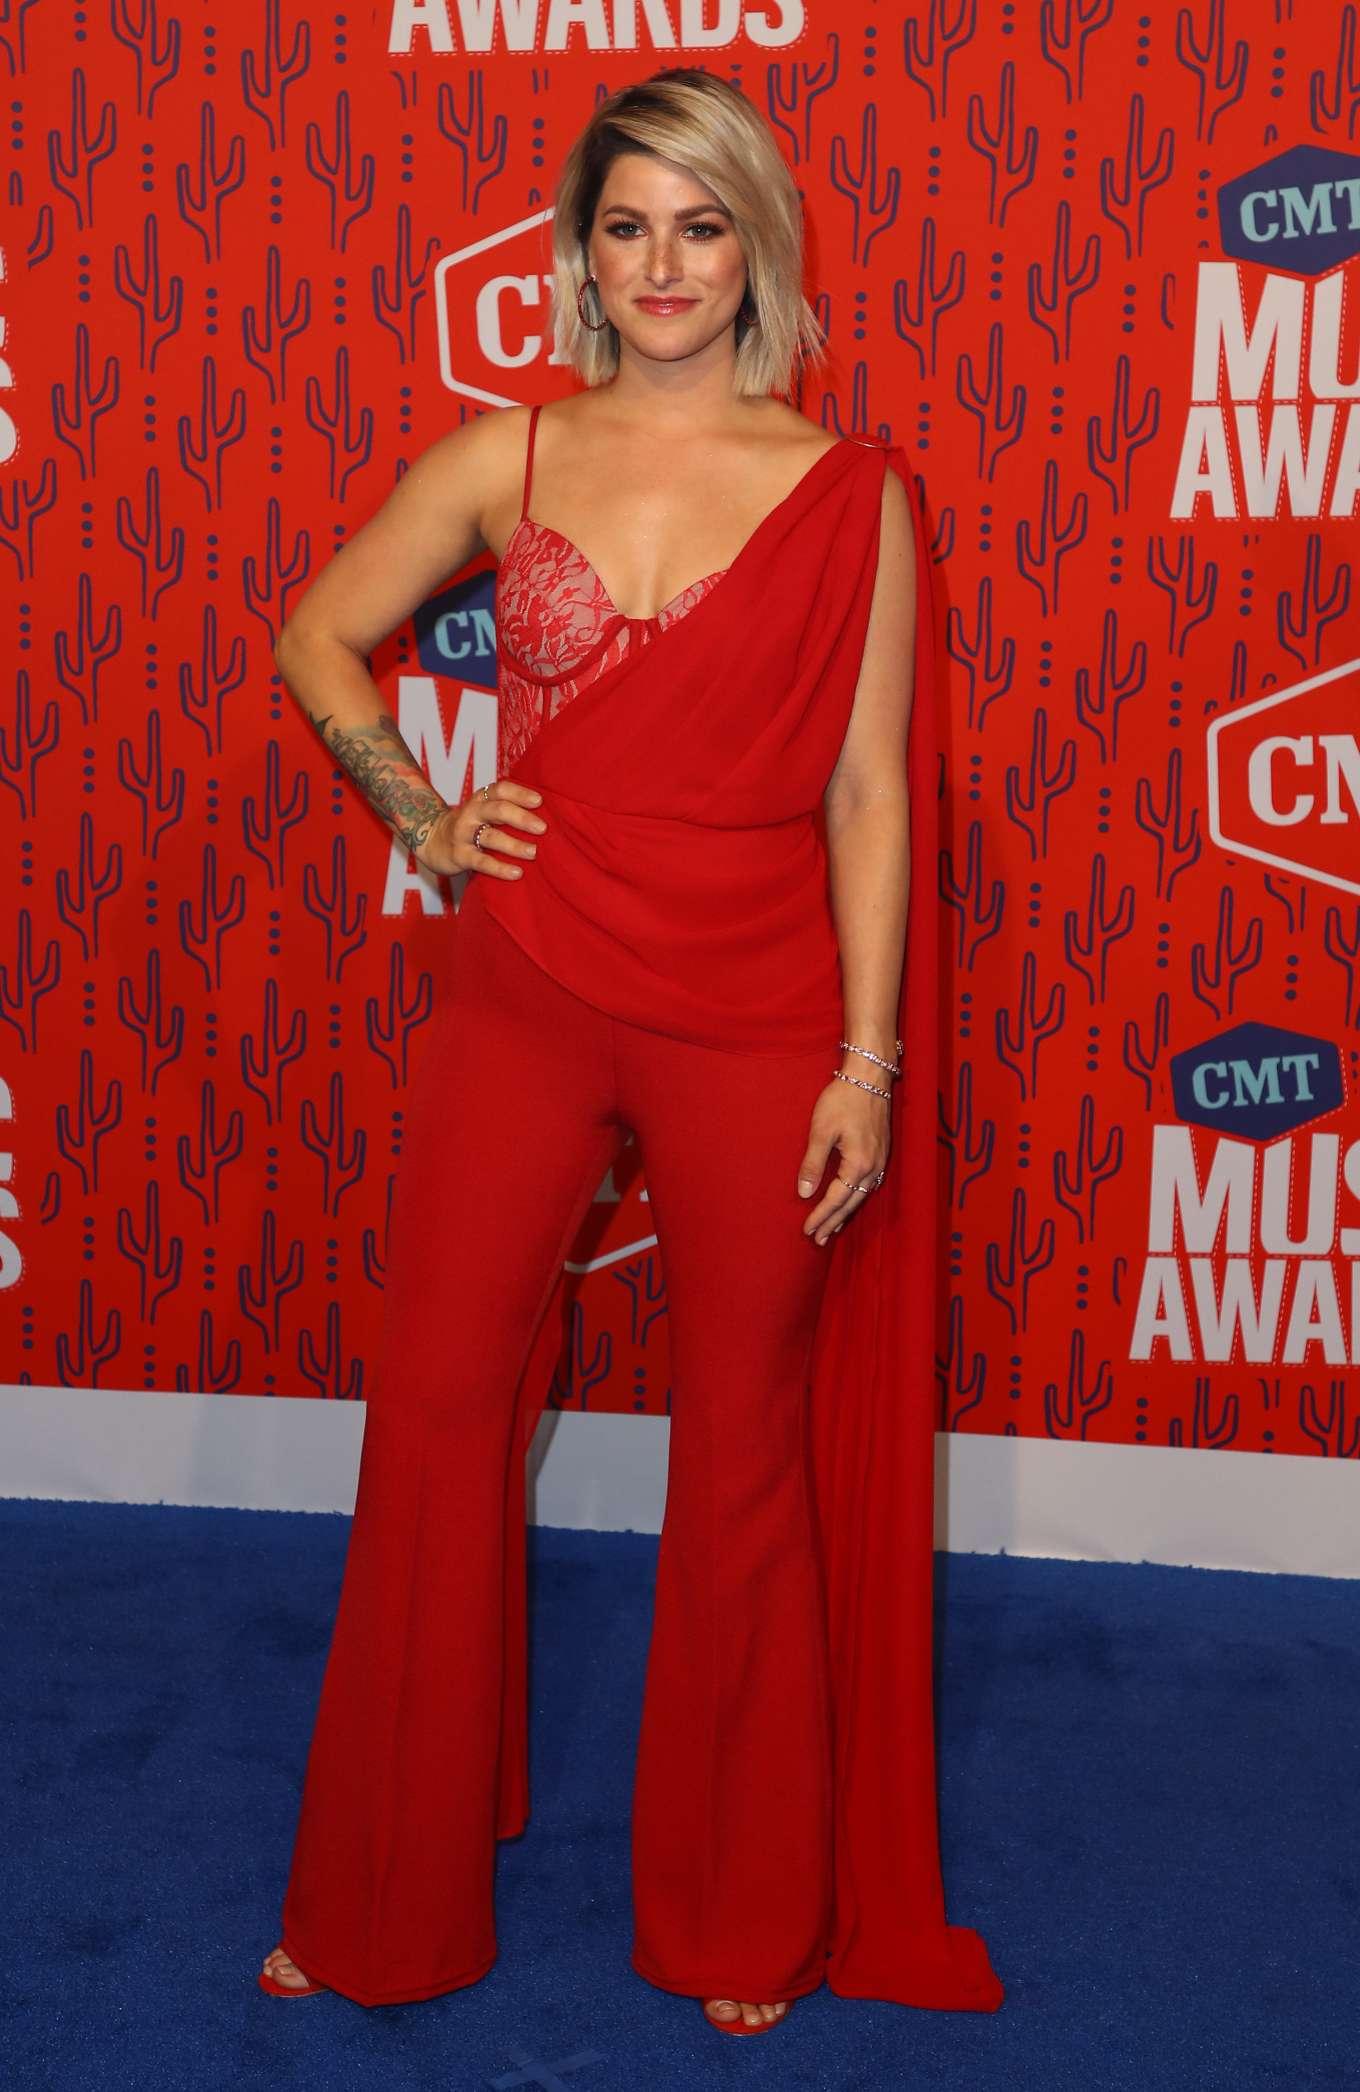 Cassadee Pope 2019 : Cassadee Pope: 2019 CMT Music Awards-28